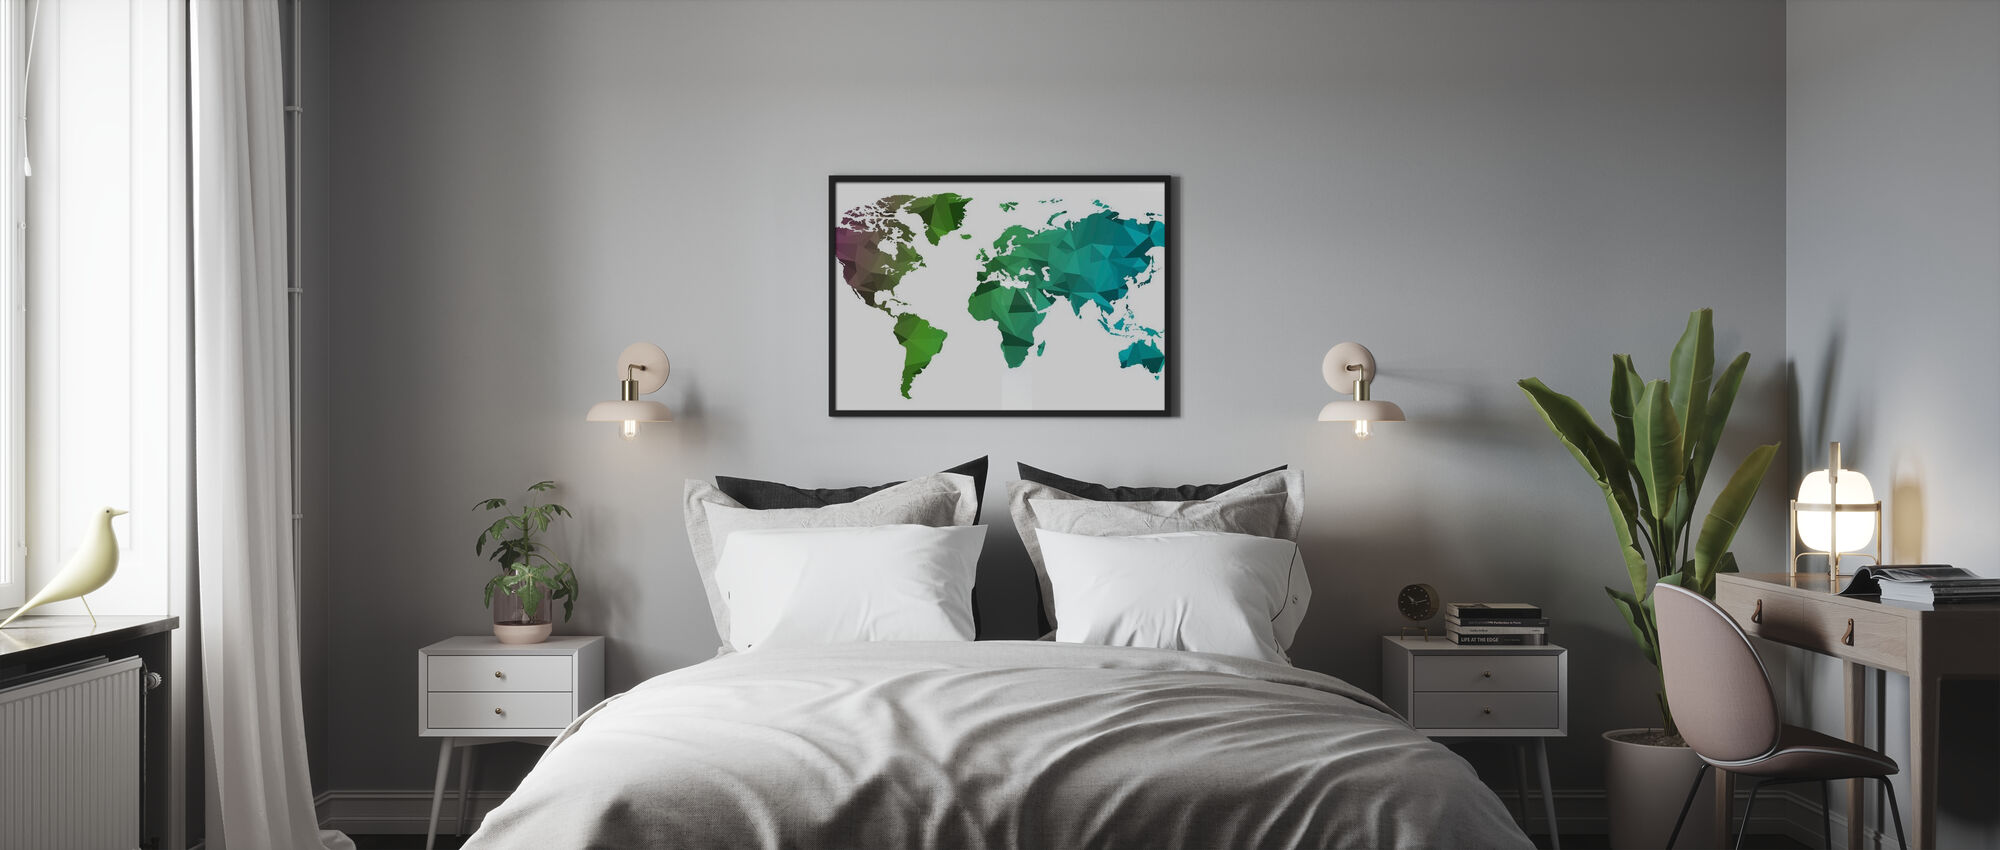 Polygonal World Map - Poster - Bedroom